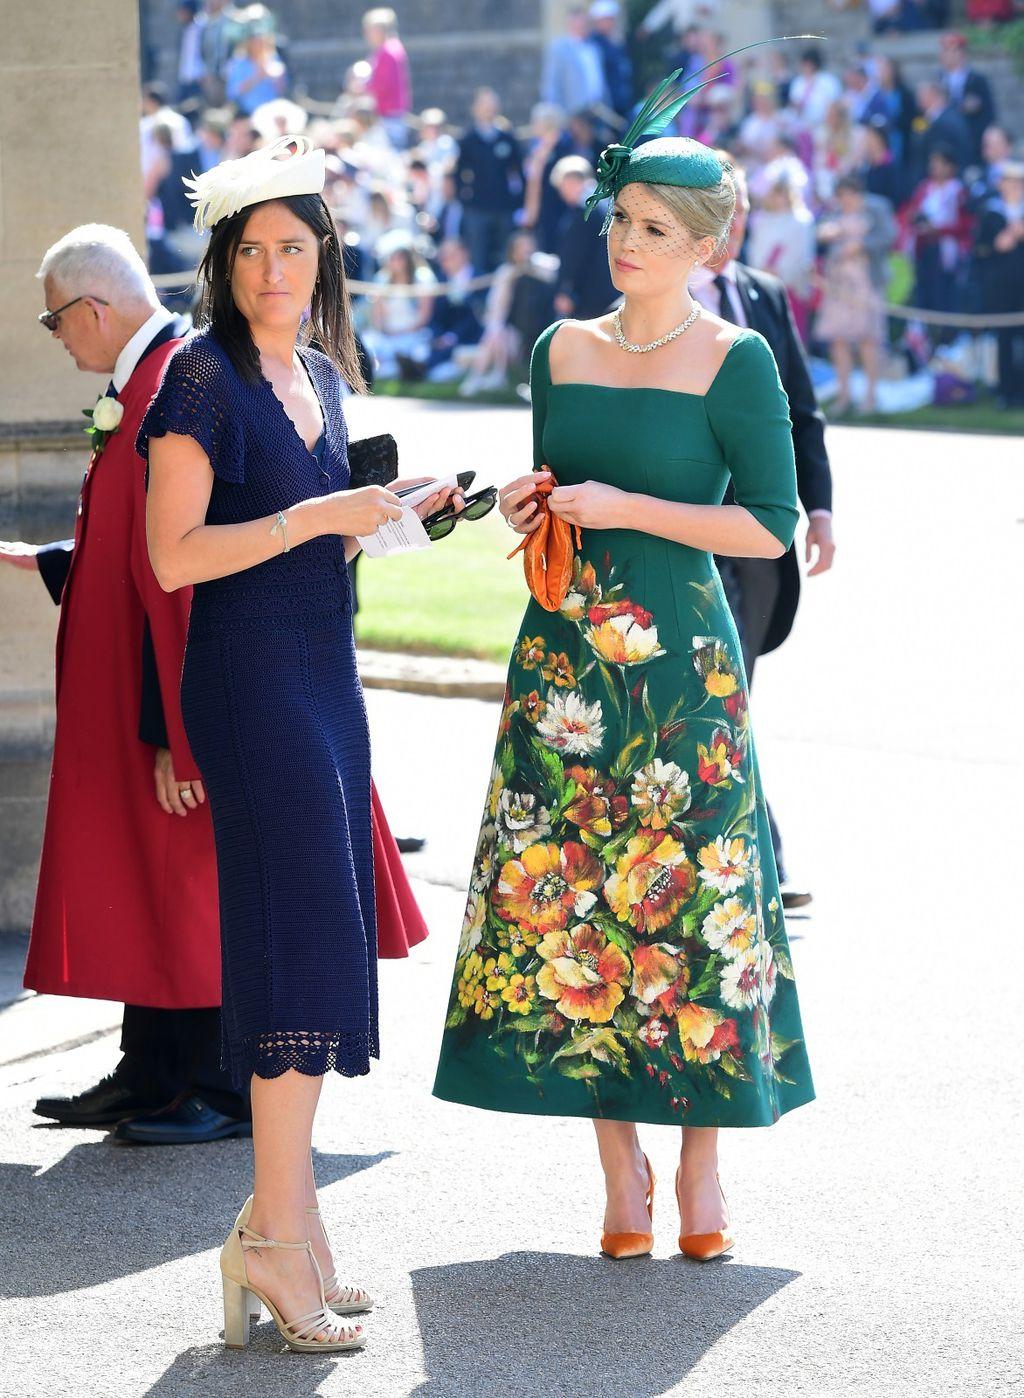 Kitty Spencer na vjenčanju princa Harryja i Meghan Markle - 3